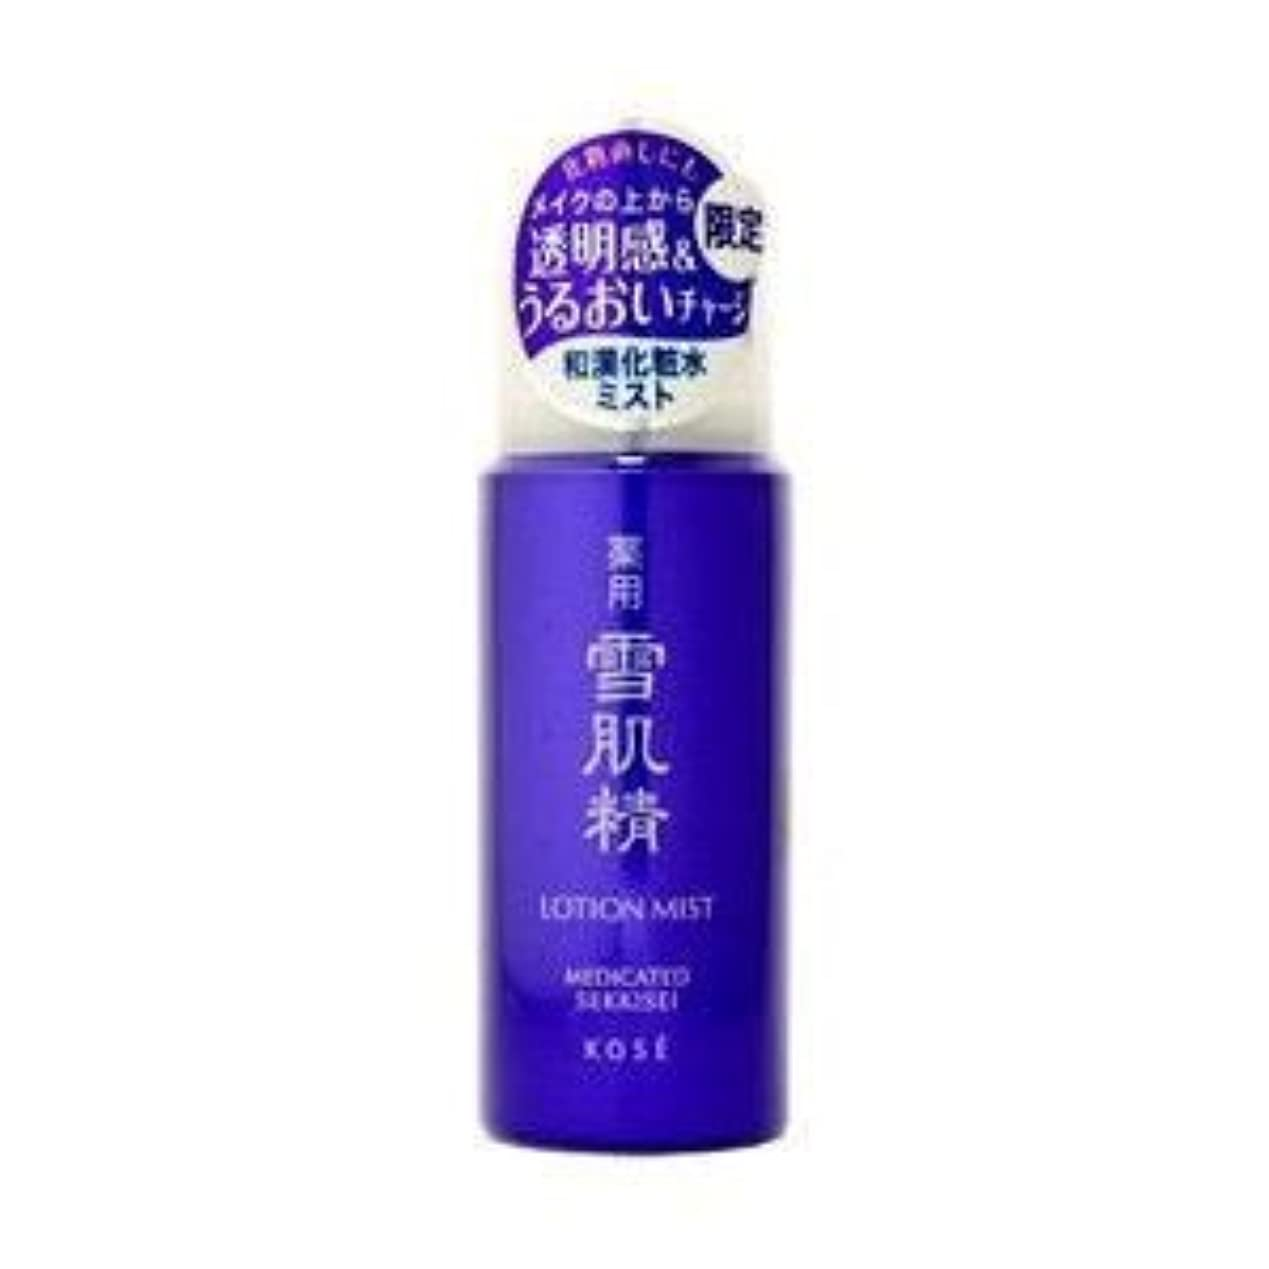 KOSE 雪肌精 ローション ミスト 【ミニ】 50g